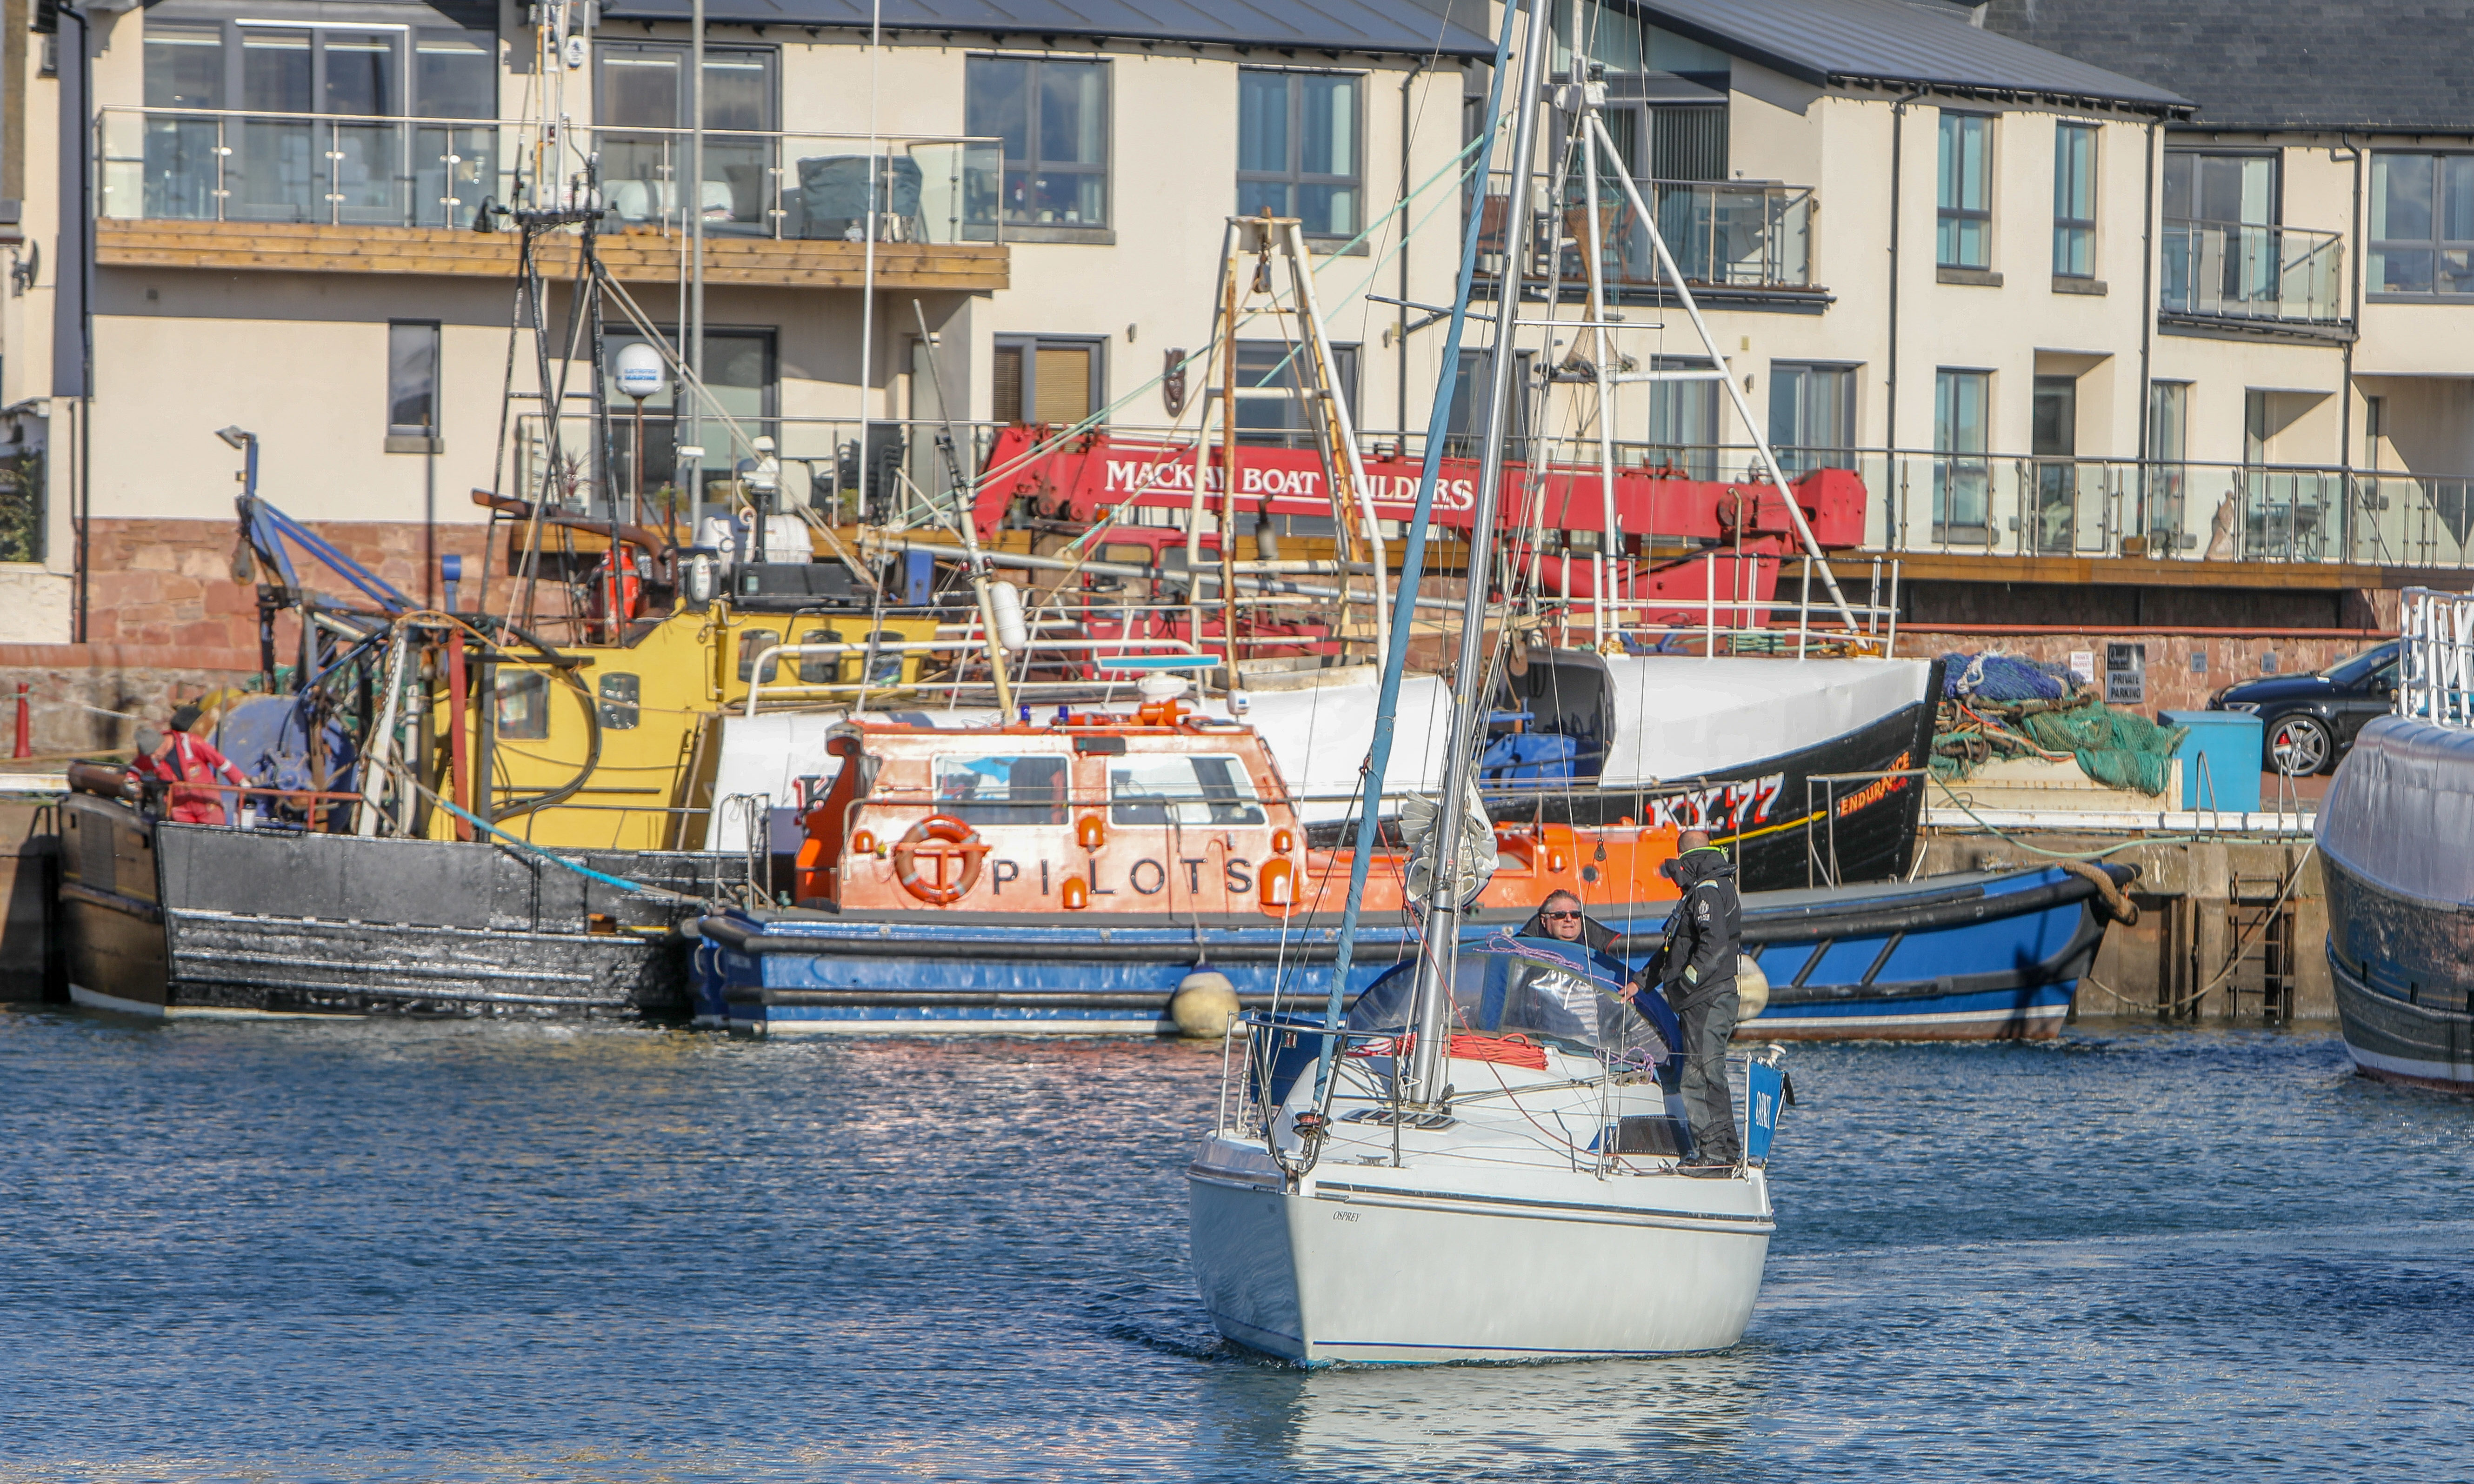 The stolen boat returning to Arbroath marina.